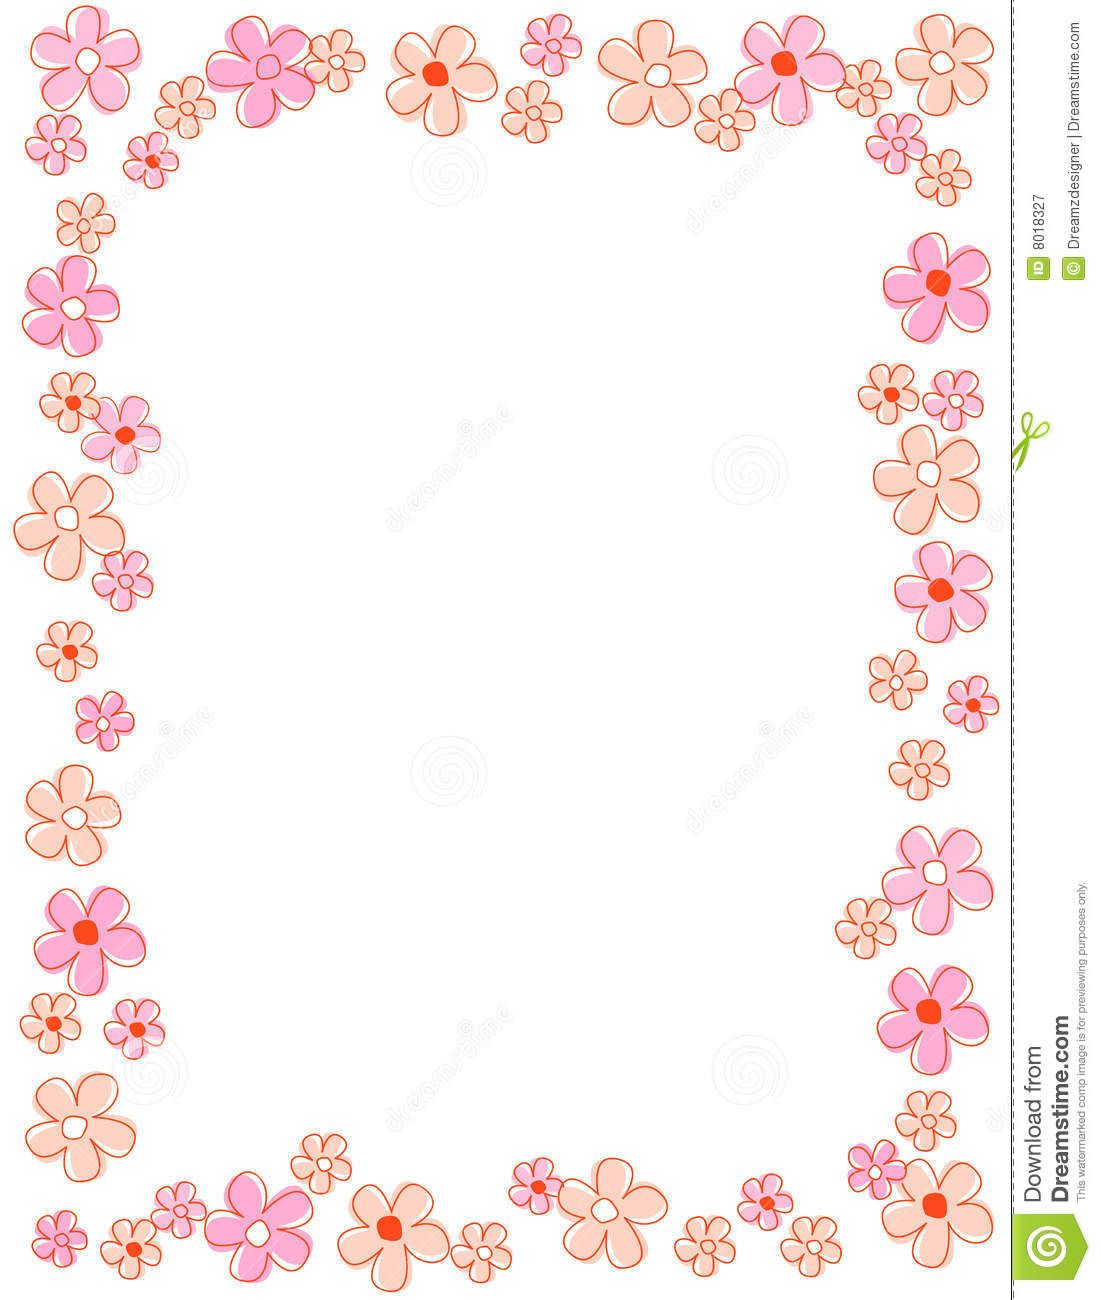 floral-border-frame-8018327.jpg (1101×1300) | Frames